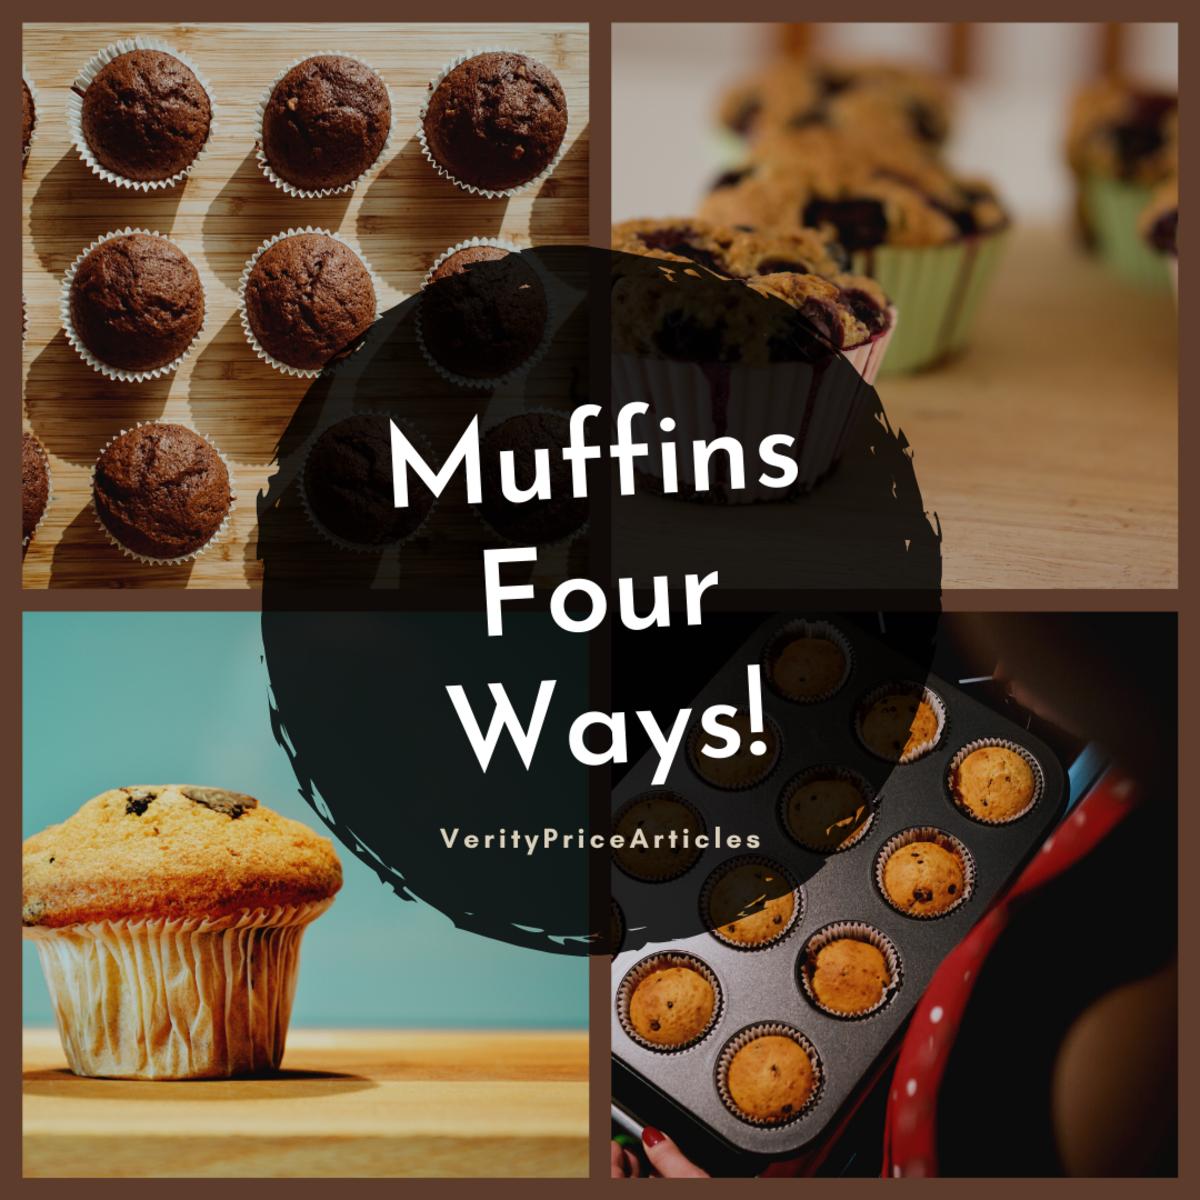 How to Make Muffins 4 Ways